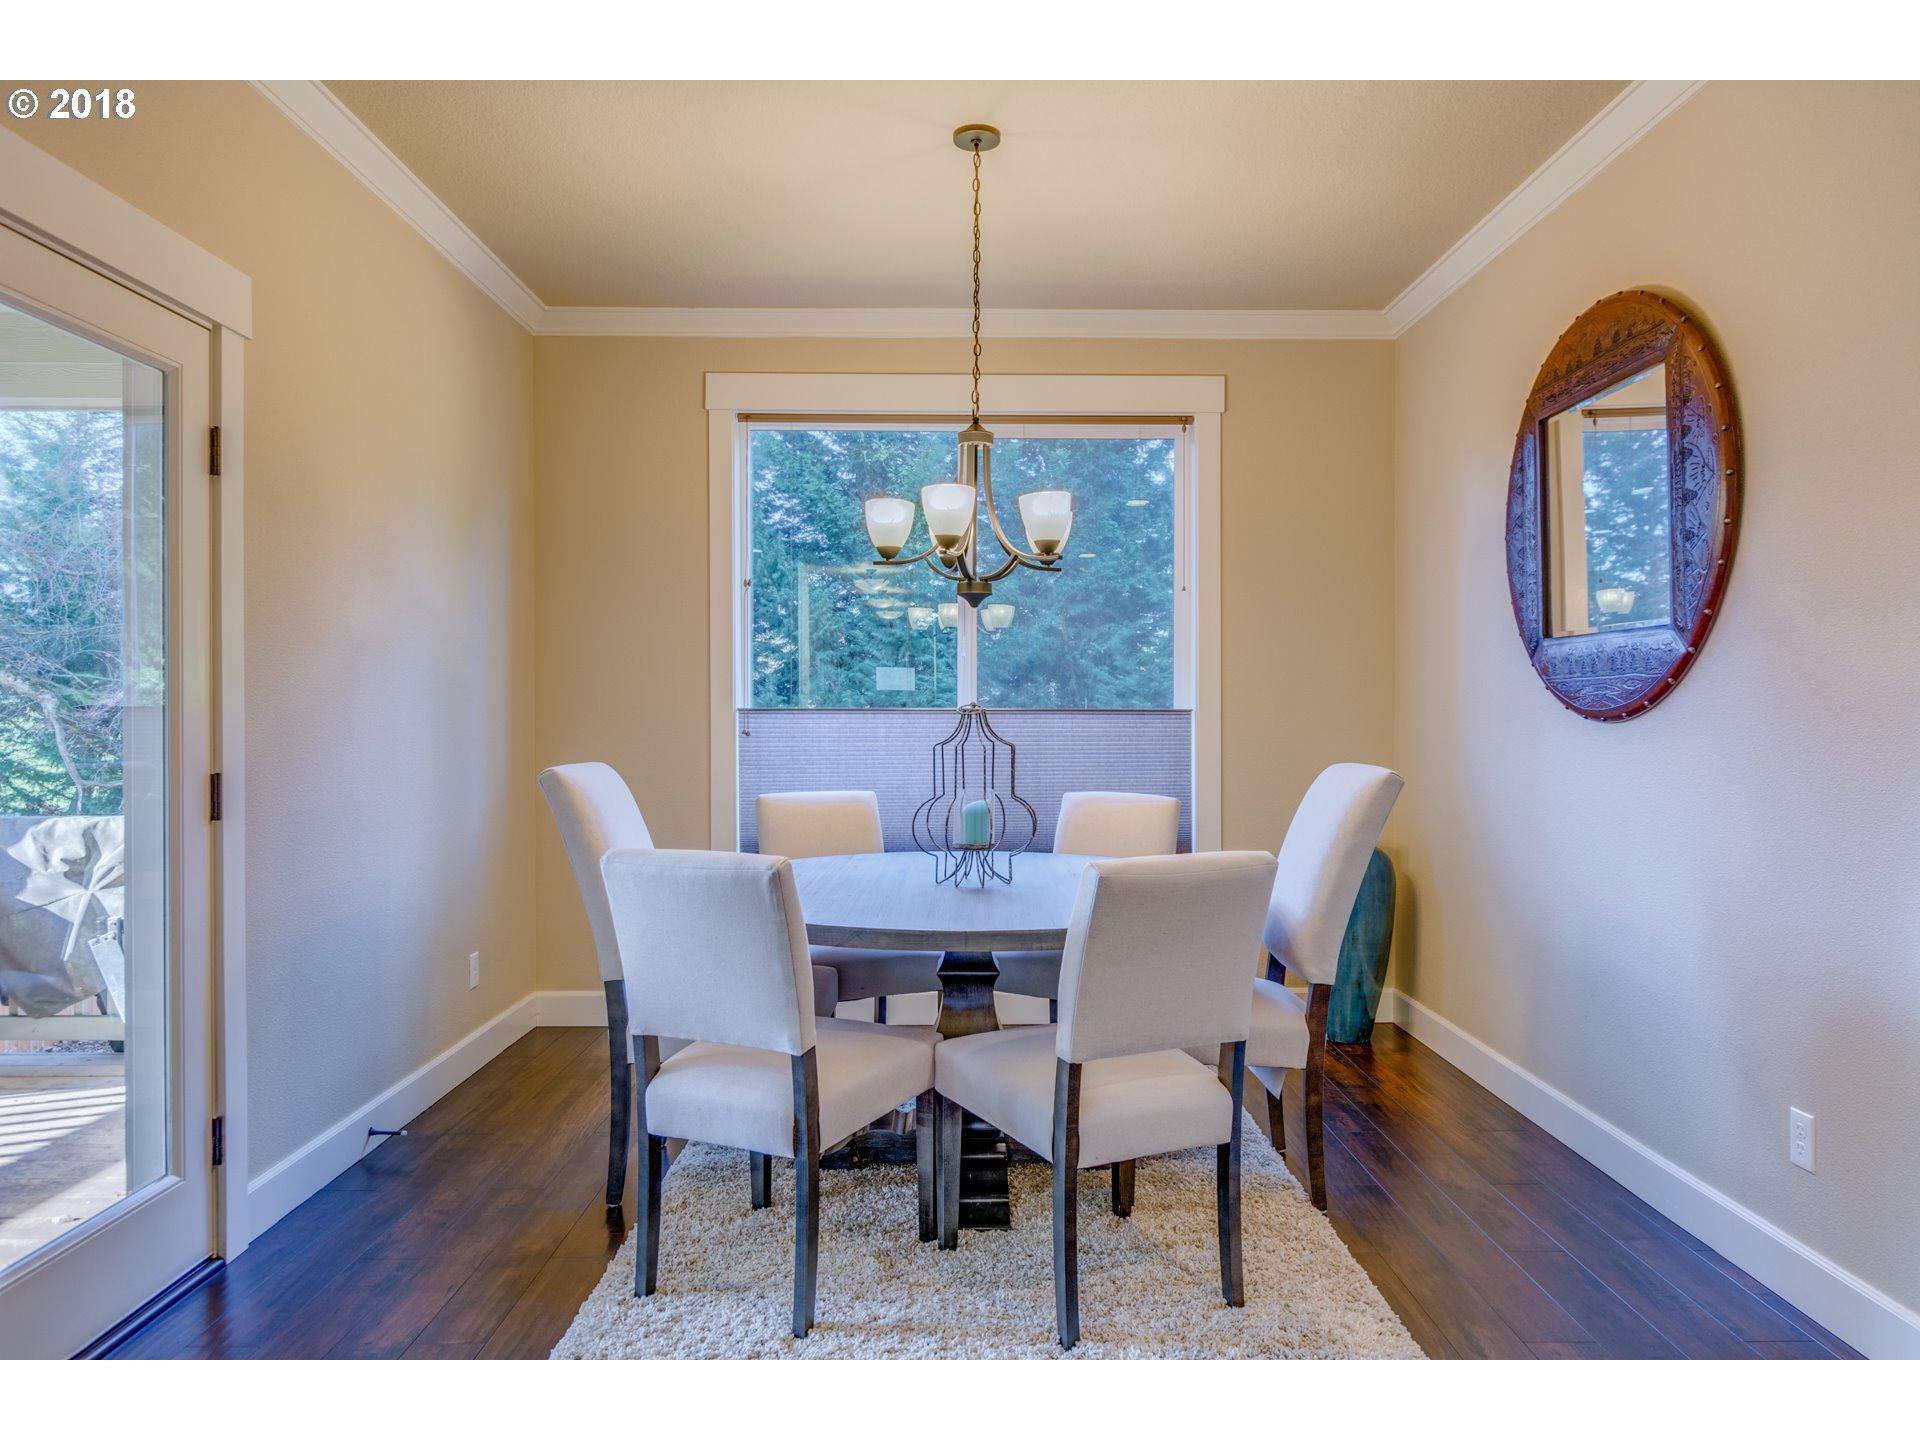 12701 ASPENWOOD LN Oregon City, OR 97045 - MLS #: 18232687